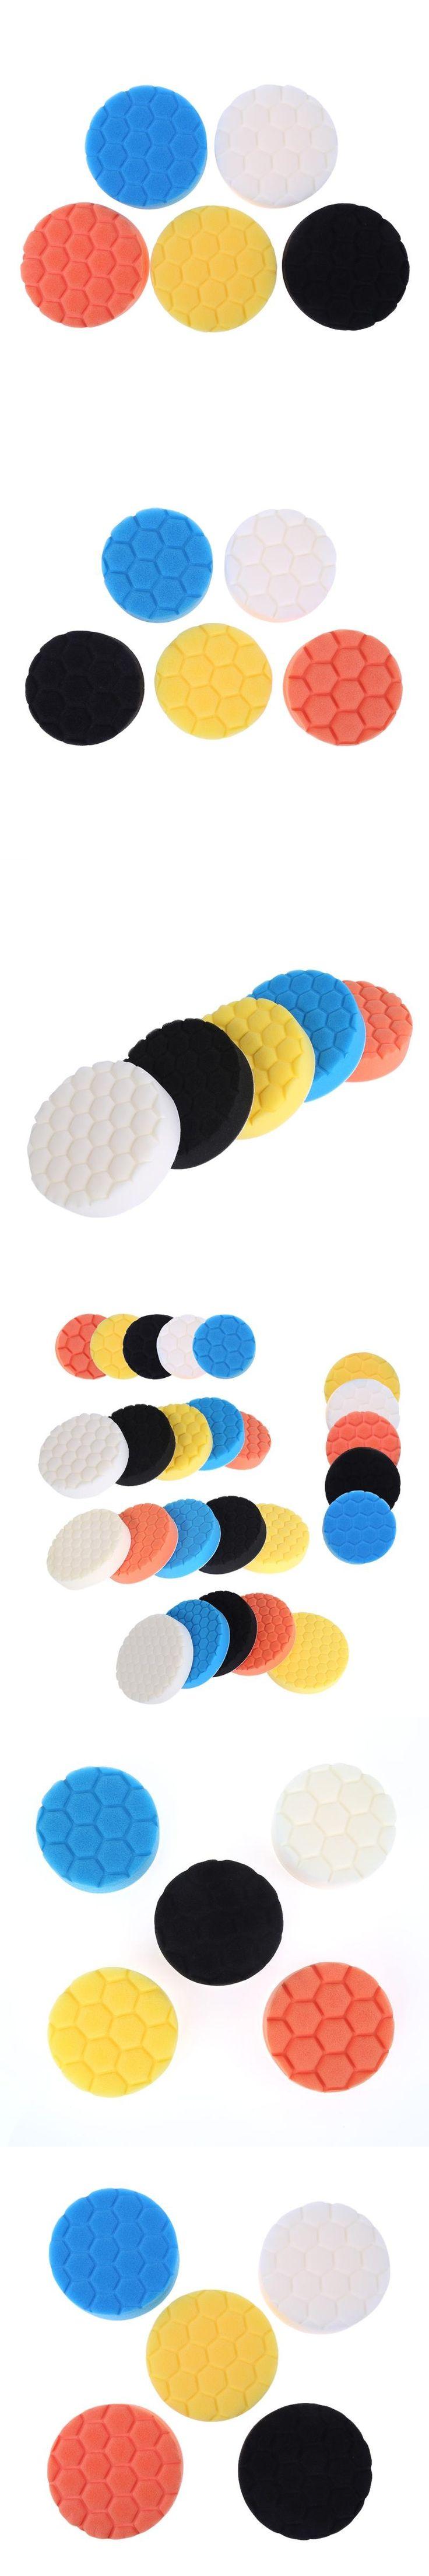 5pcs 3/4/5/6/7inch car polishing pad set Polishing Buffer Waxing Buffing Pad Drill Set Kit Car Polishing sponge Wheel Kit